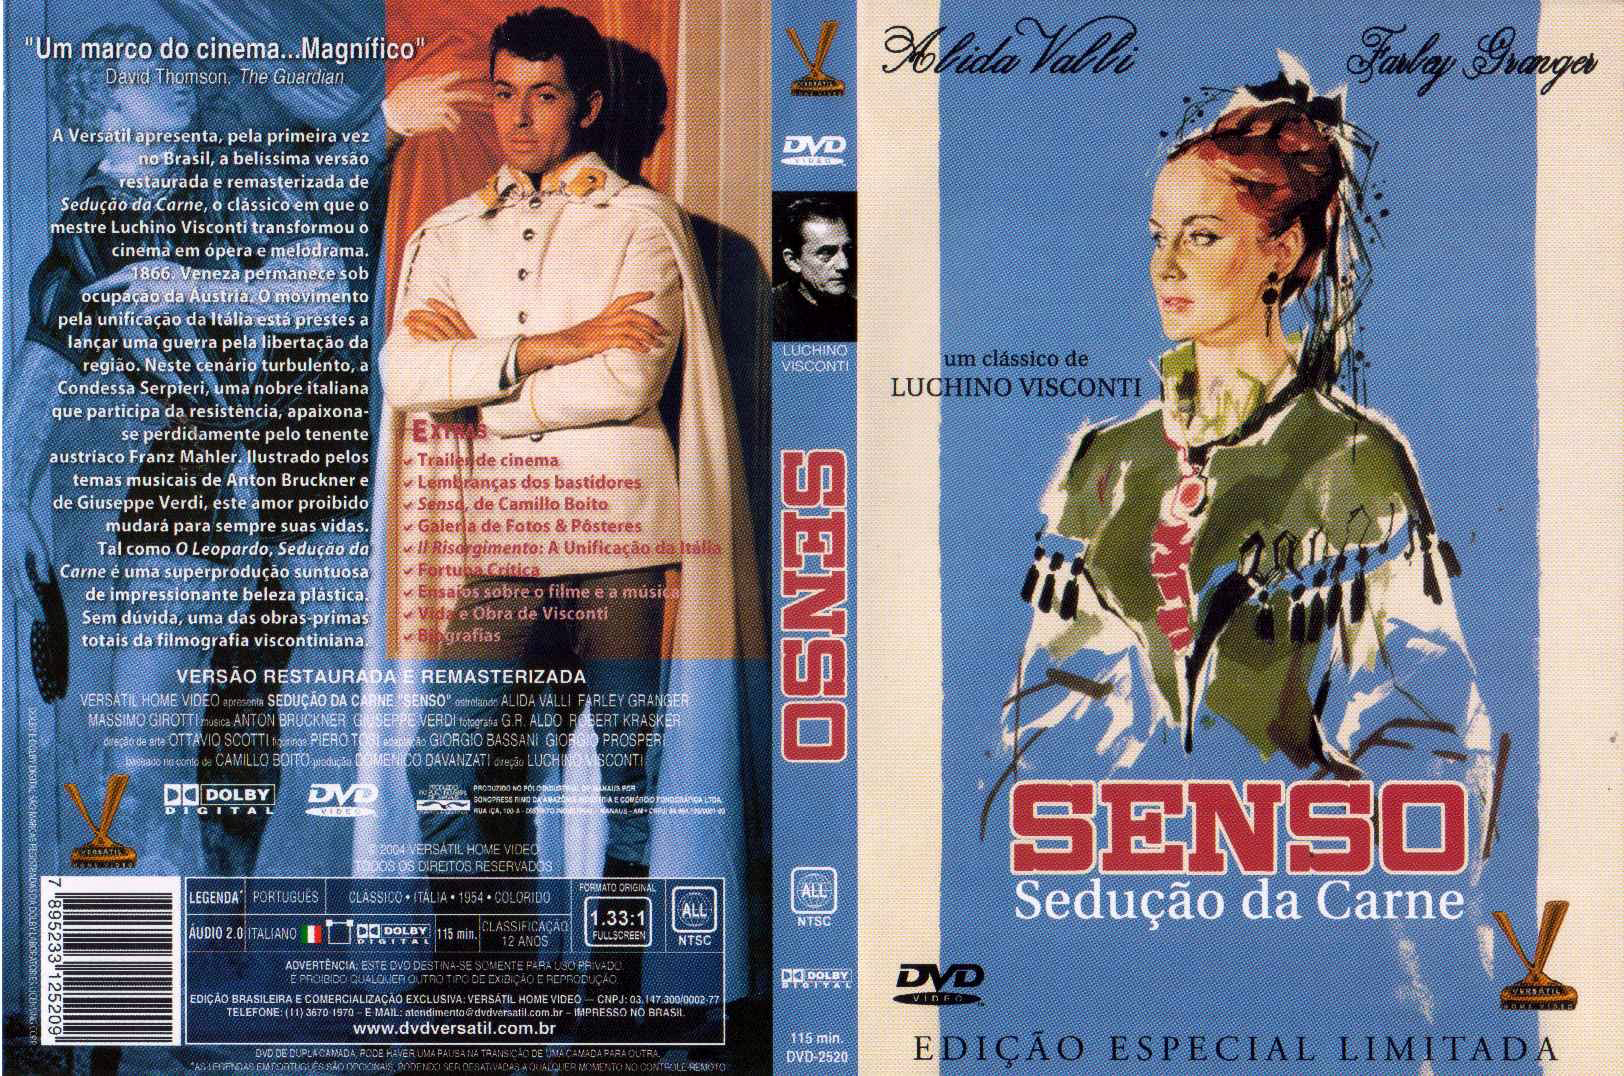 senso 1954 full movie